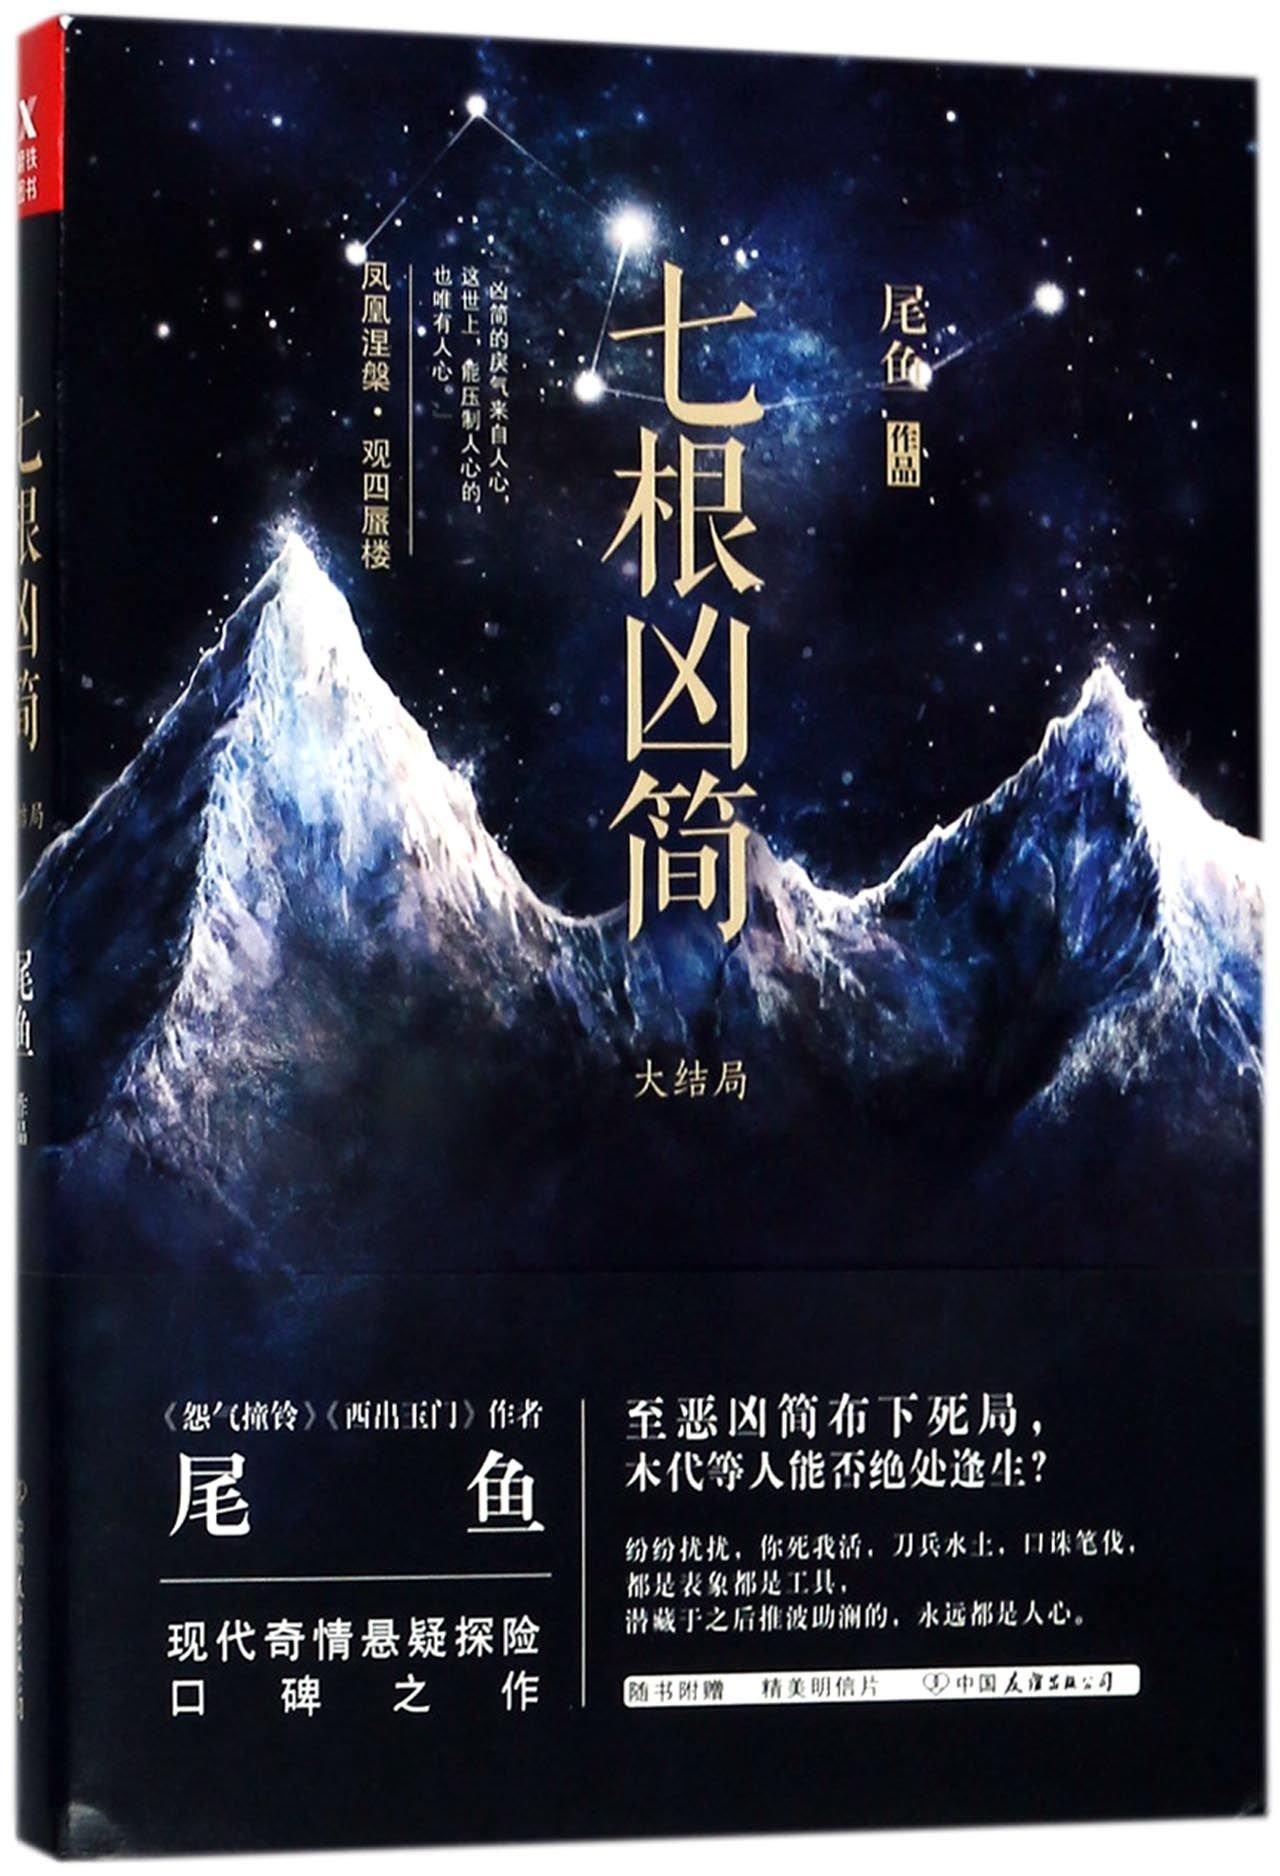 Seven Inauspicious Bamboo Slips (Final Part) (Chinese Edition) PDF